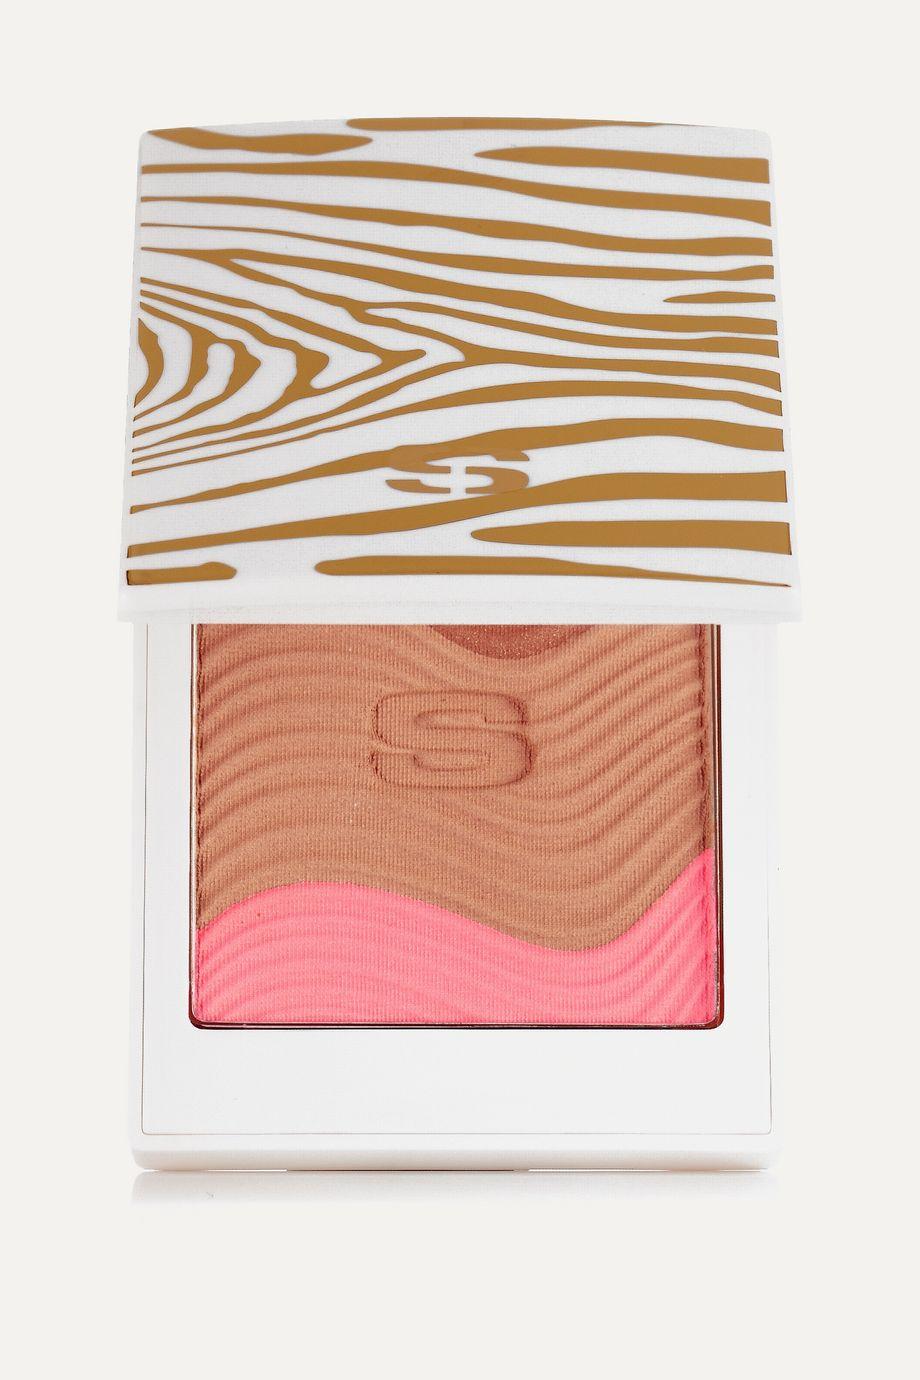 Sisley Trio de poudres Phyto-Touche Sun Glow Powder, Honey Cinnamon